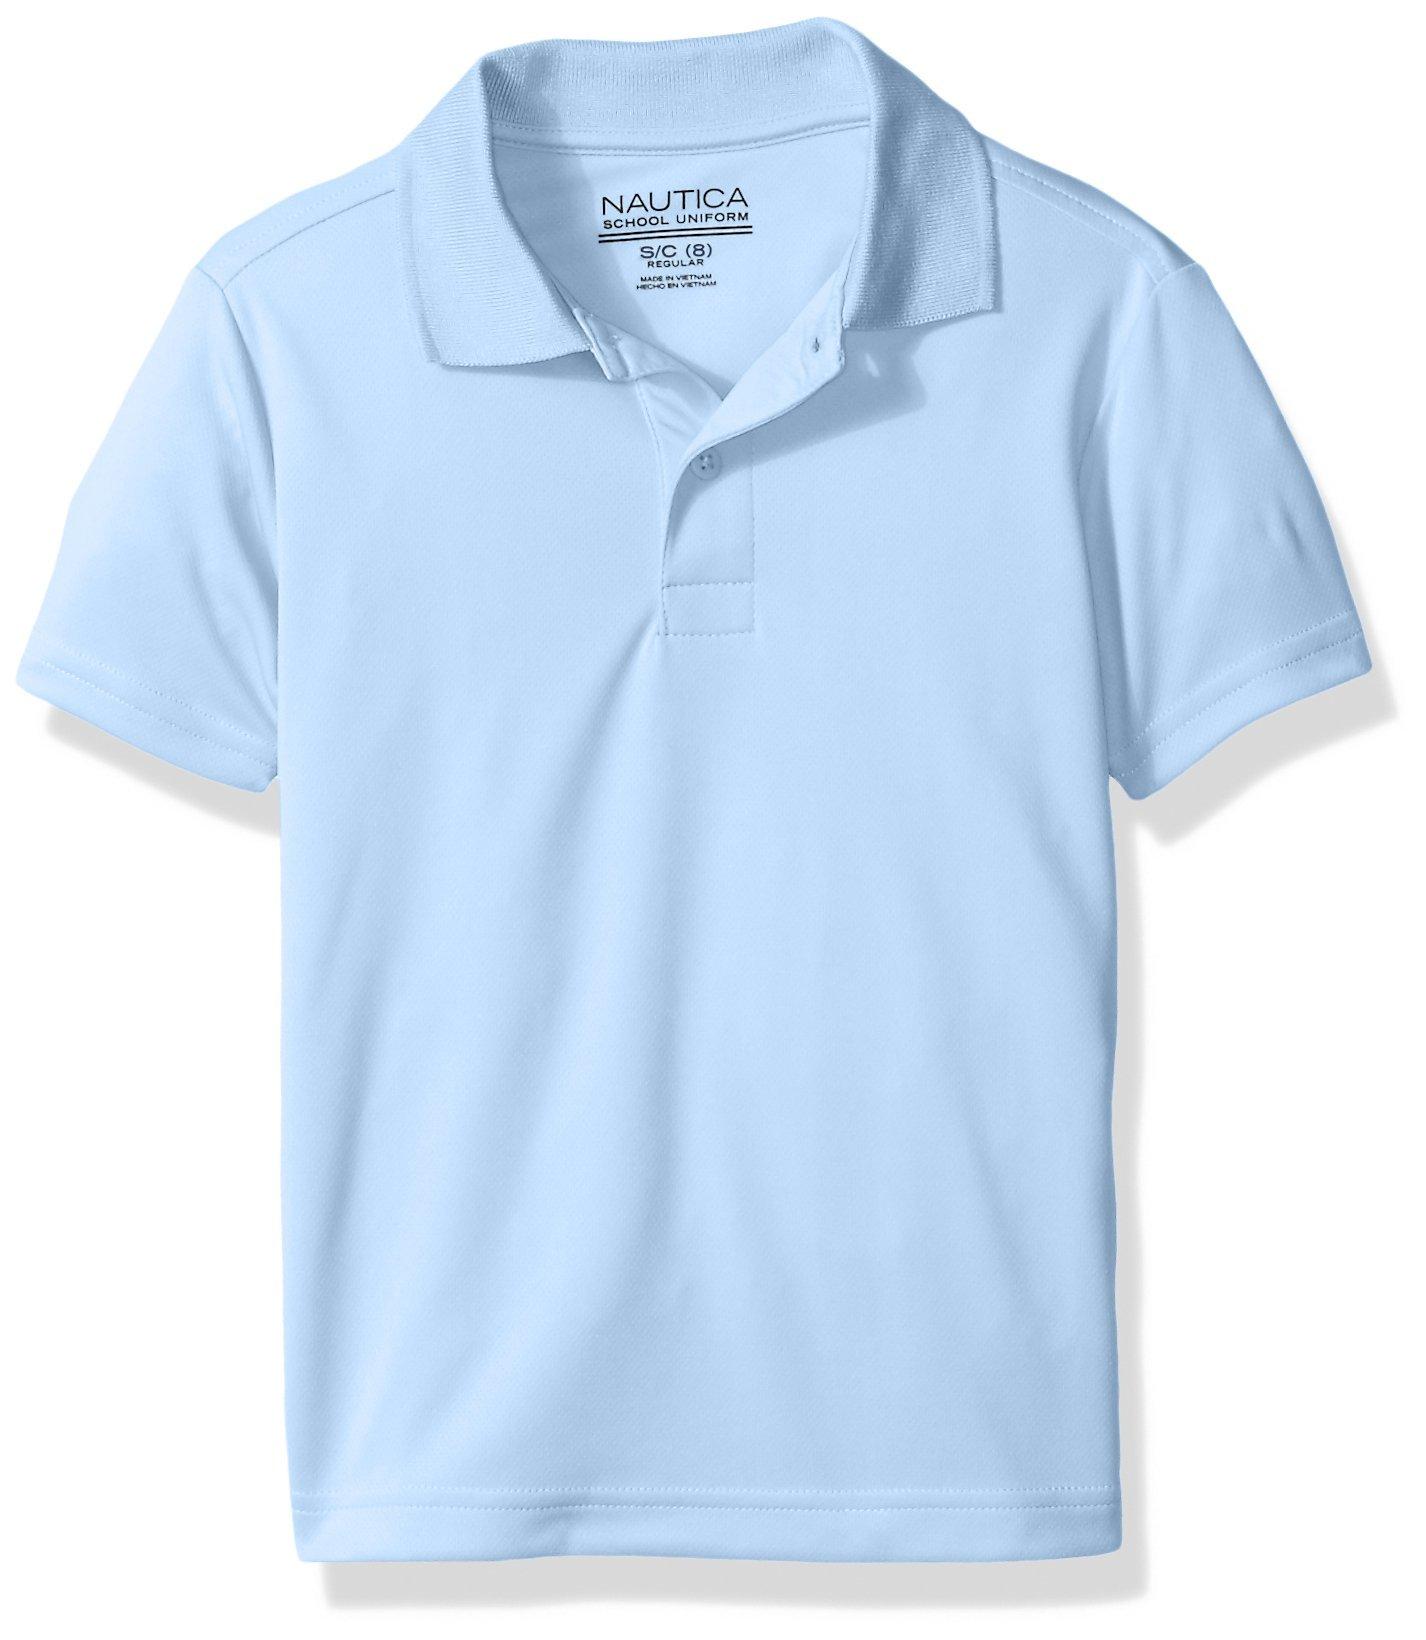 Nautica Boys' Little Boys' Uniform Short Sleeve Performance Polo, Light Blue, Medium/5